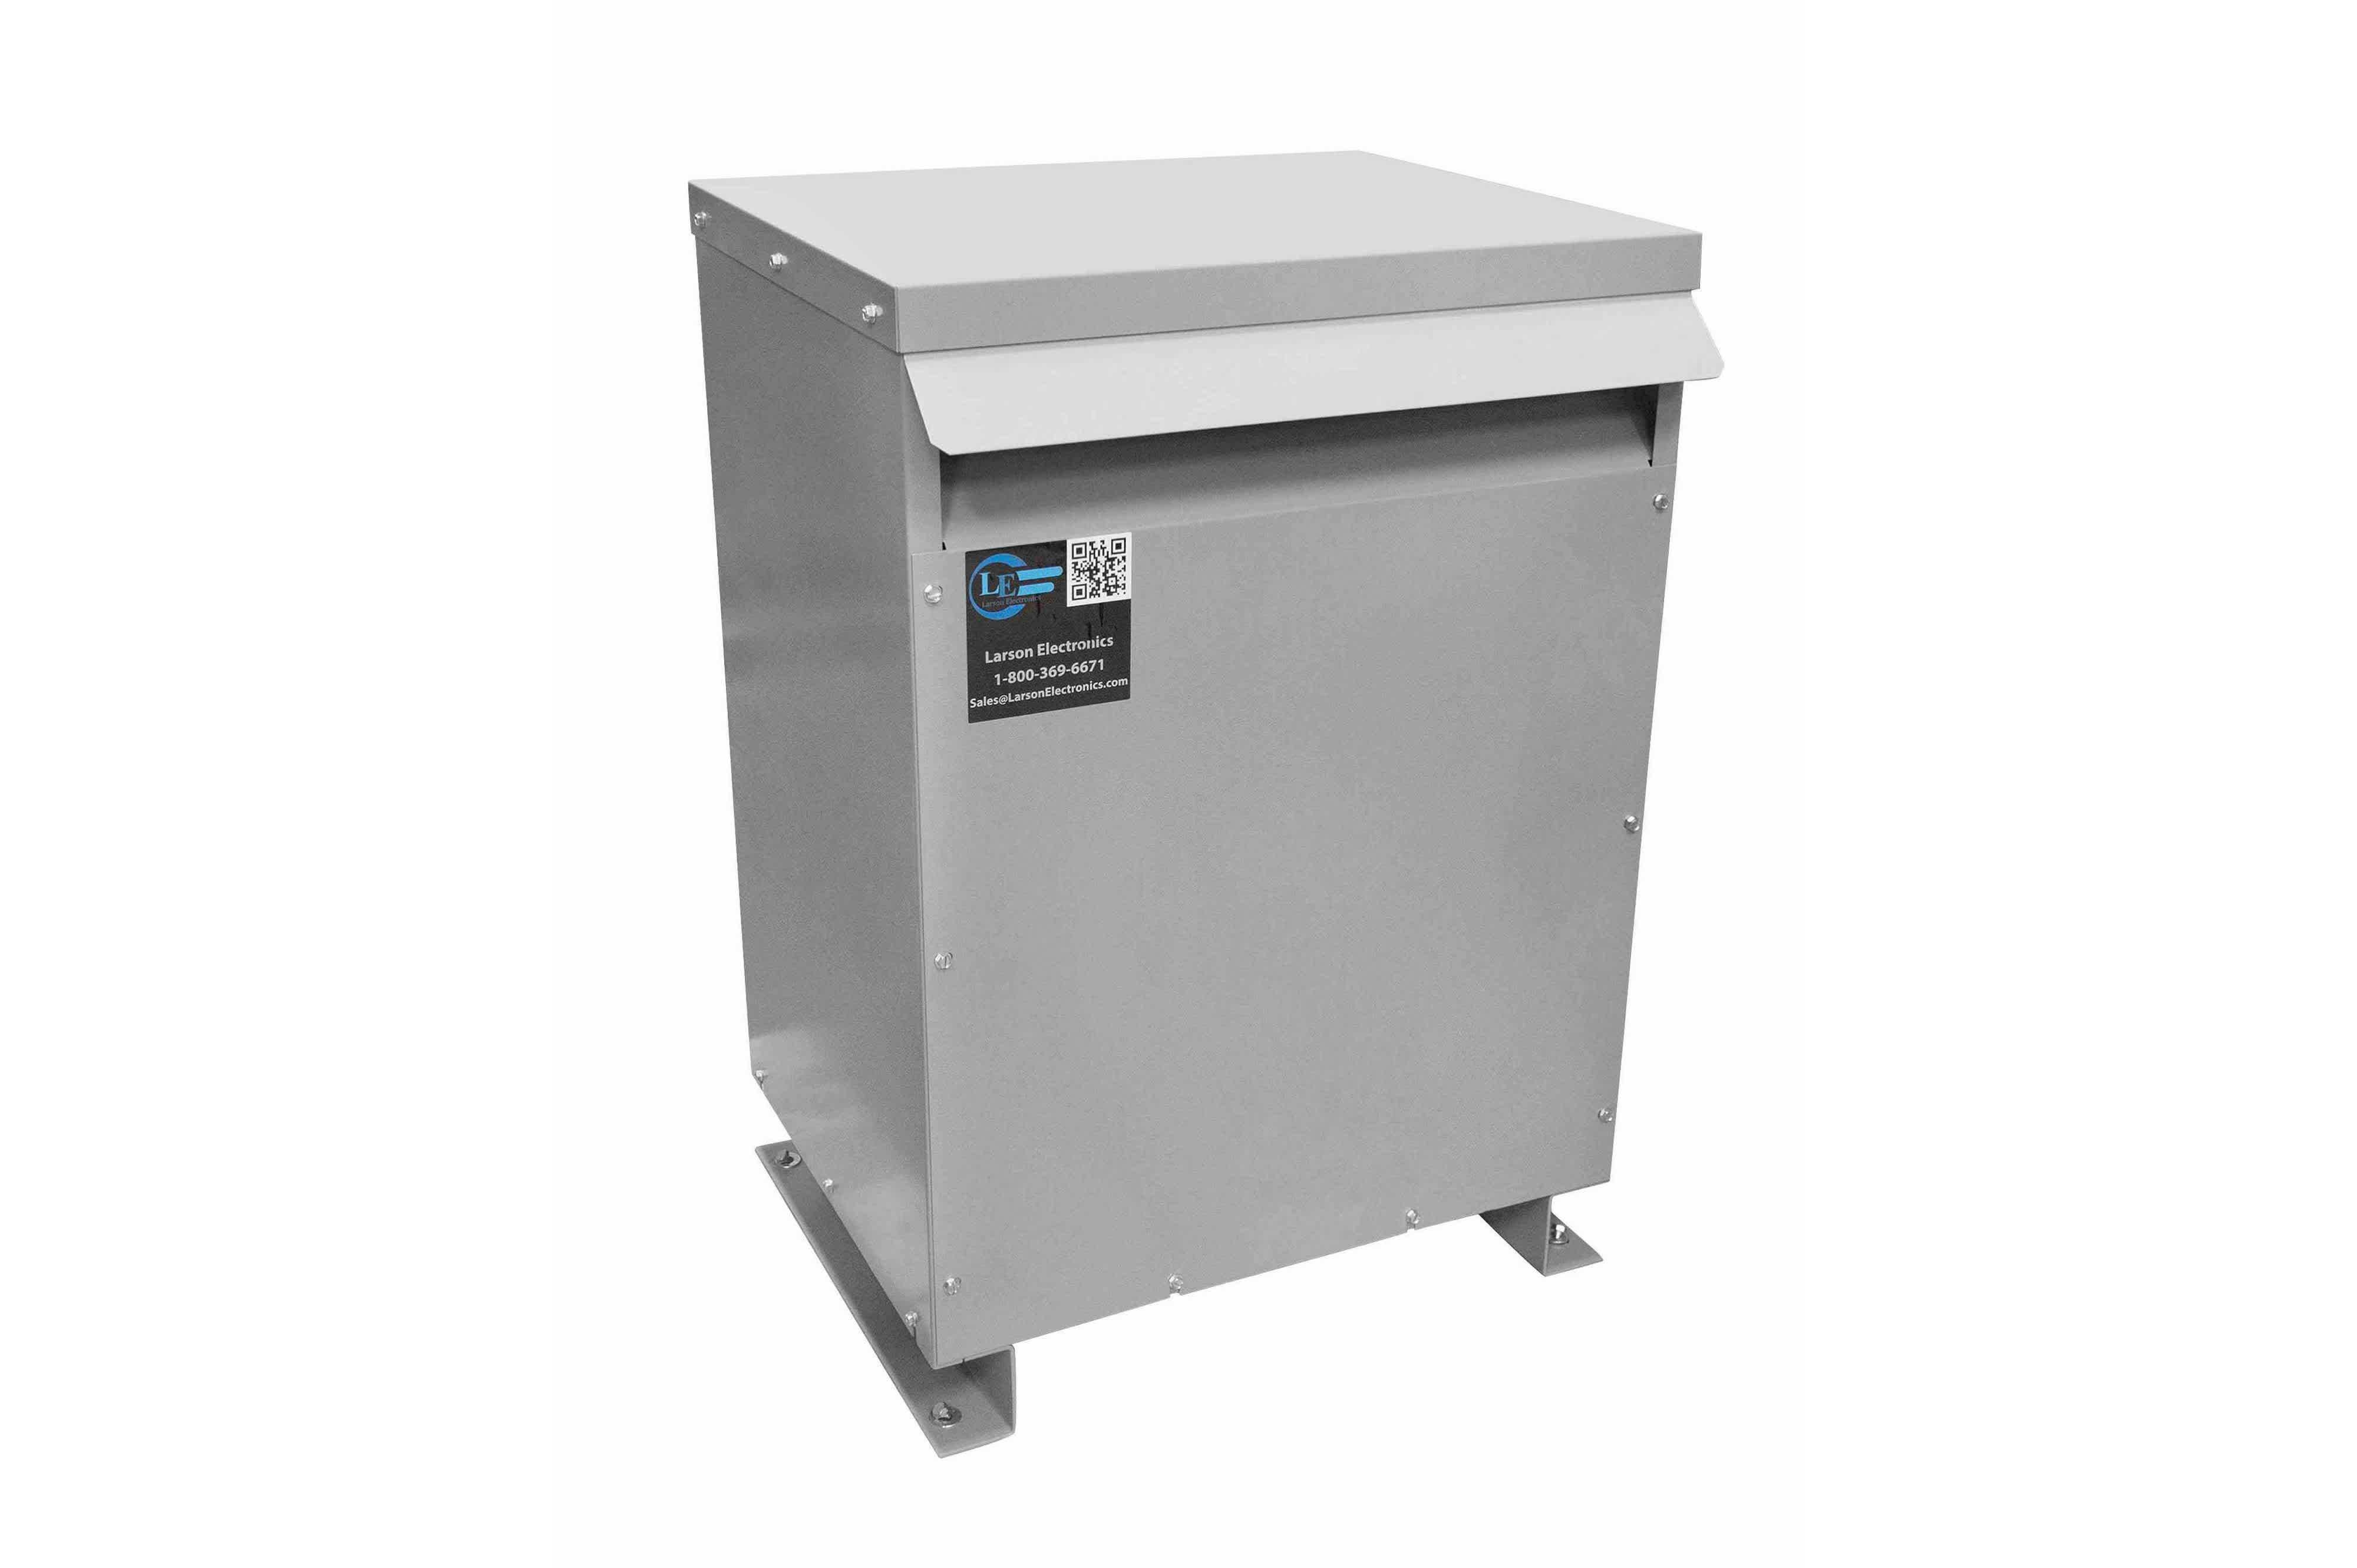 36 kVA 3PH Isolation Transformer, 460V Wye Primary, 240V/120 Delta Secondary, N3R, Ventilated, 60 Hz